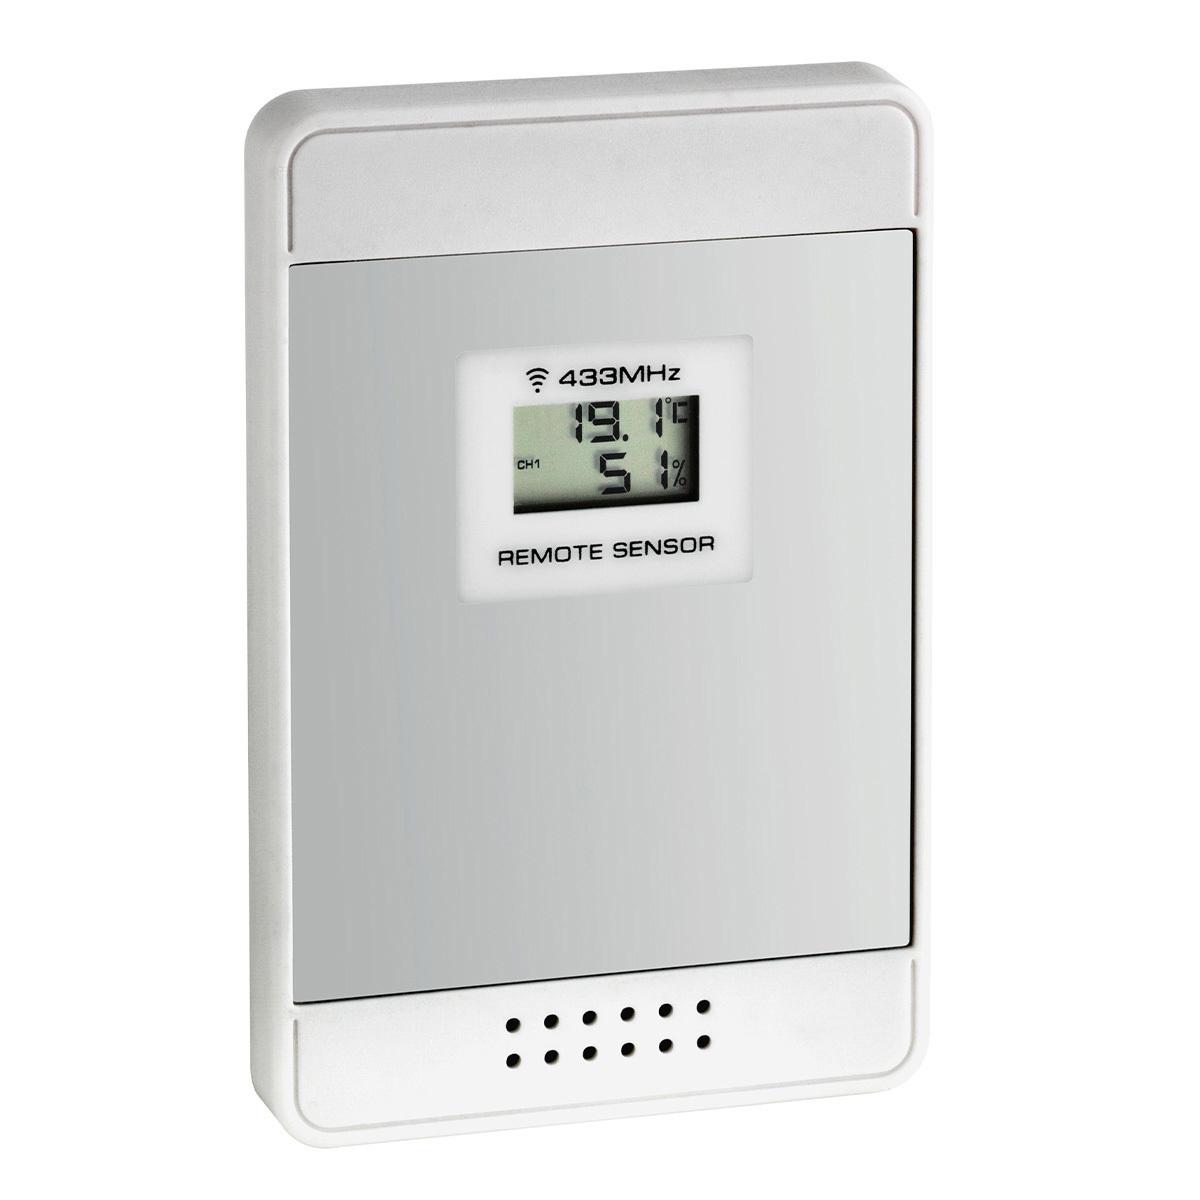 30-3209-02-thermo-hygro-sender-1200x1200px.jpg